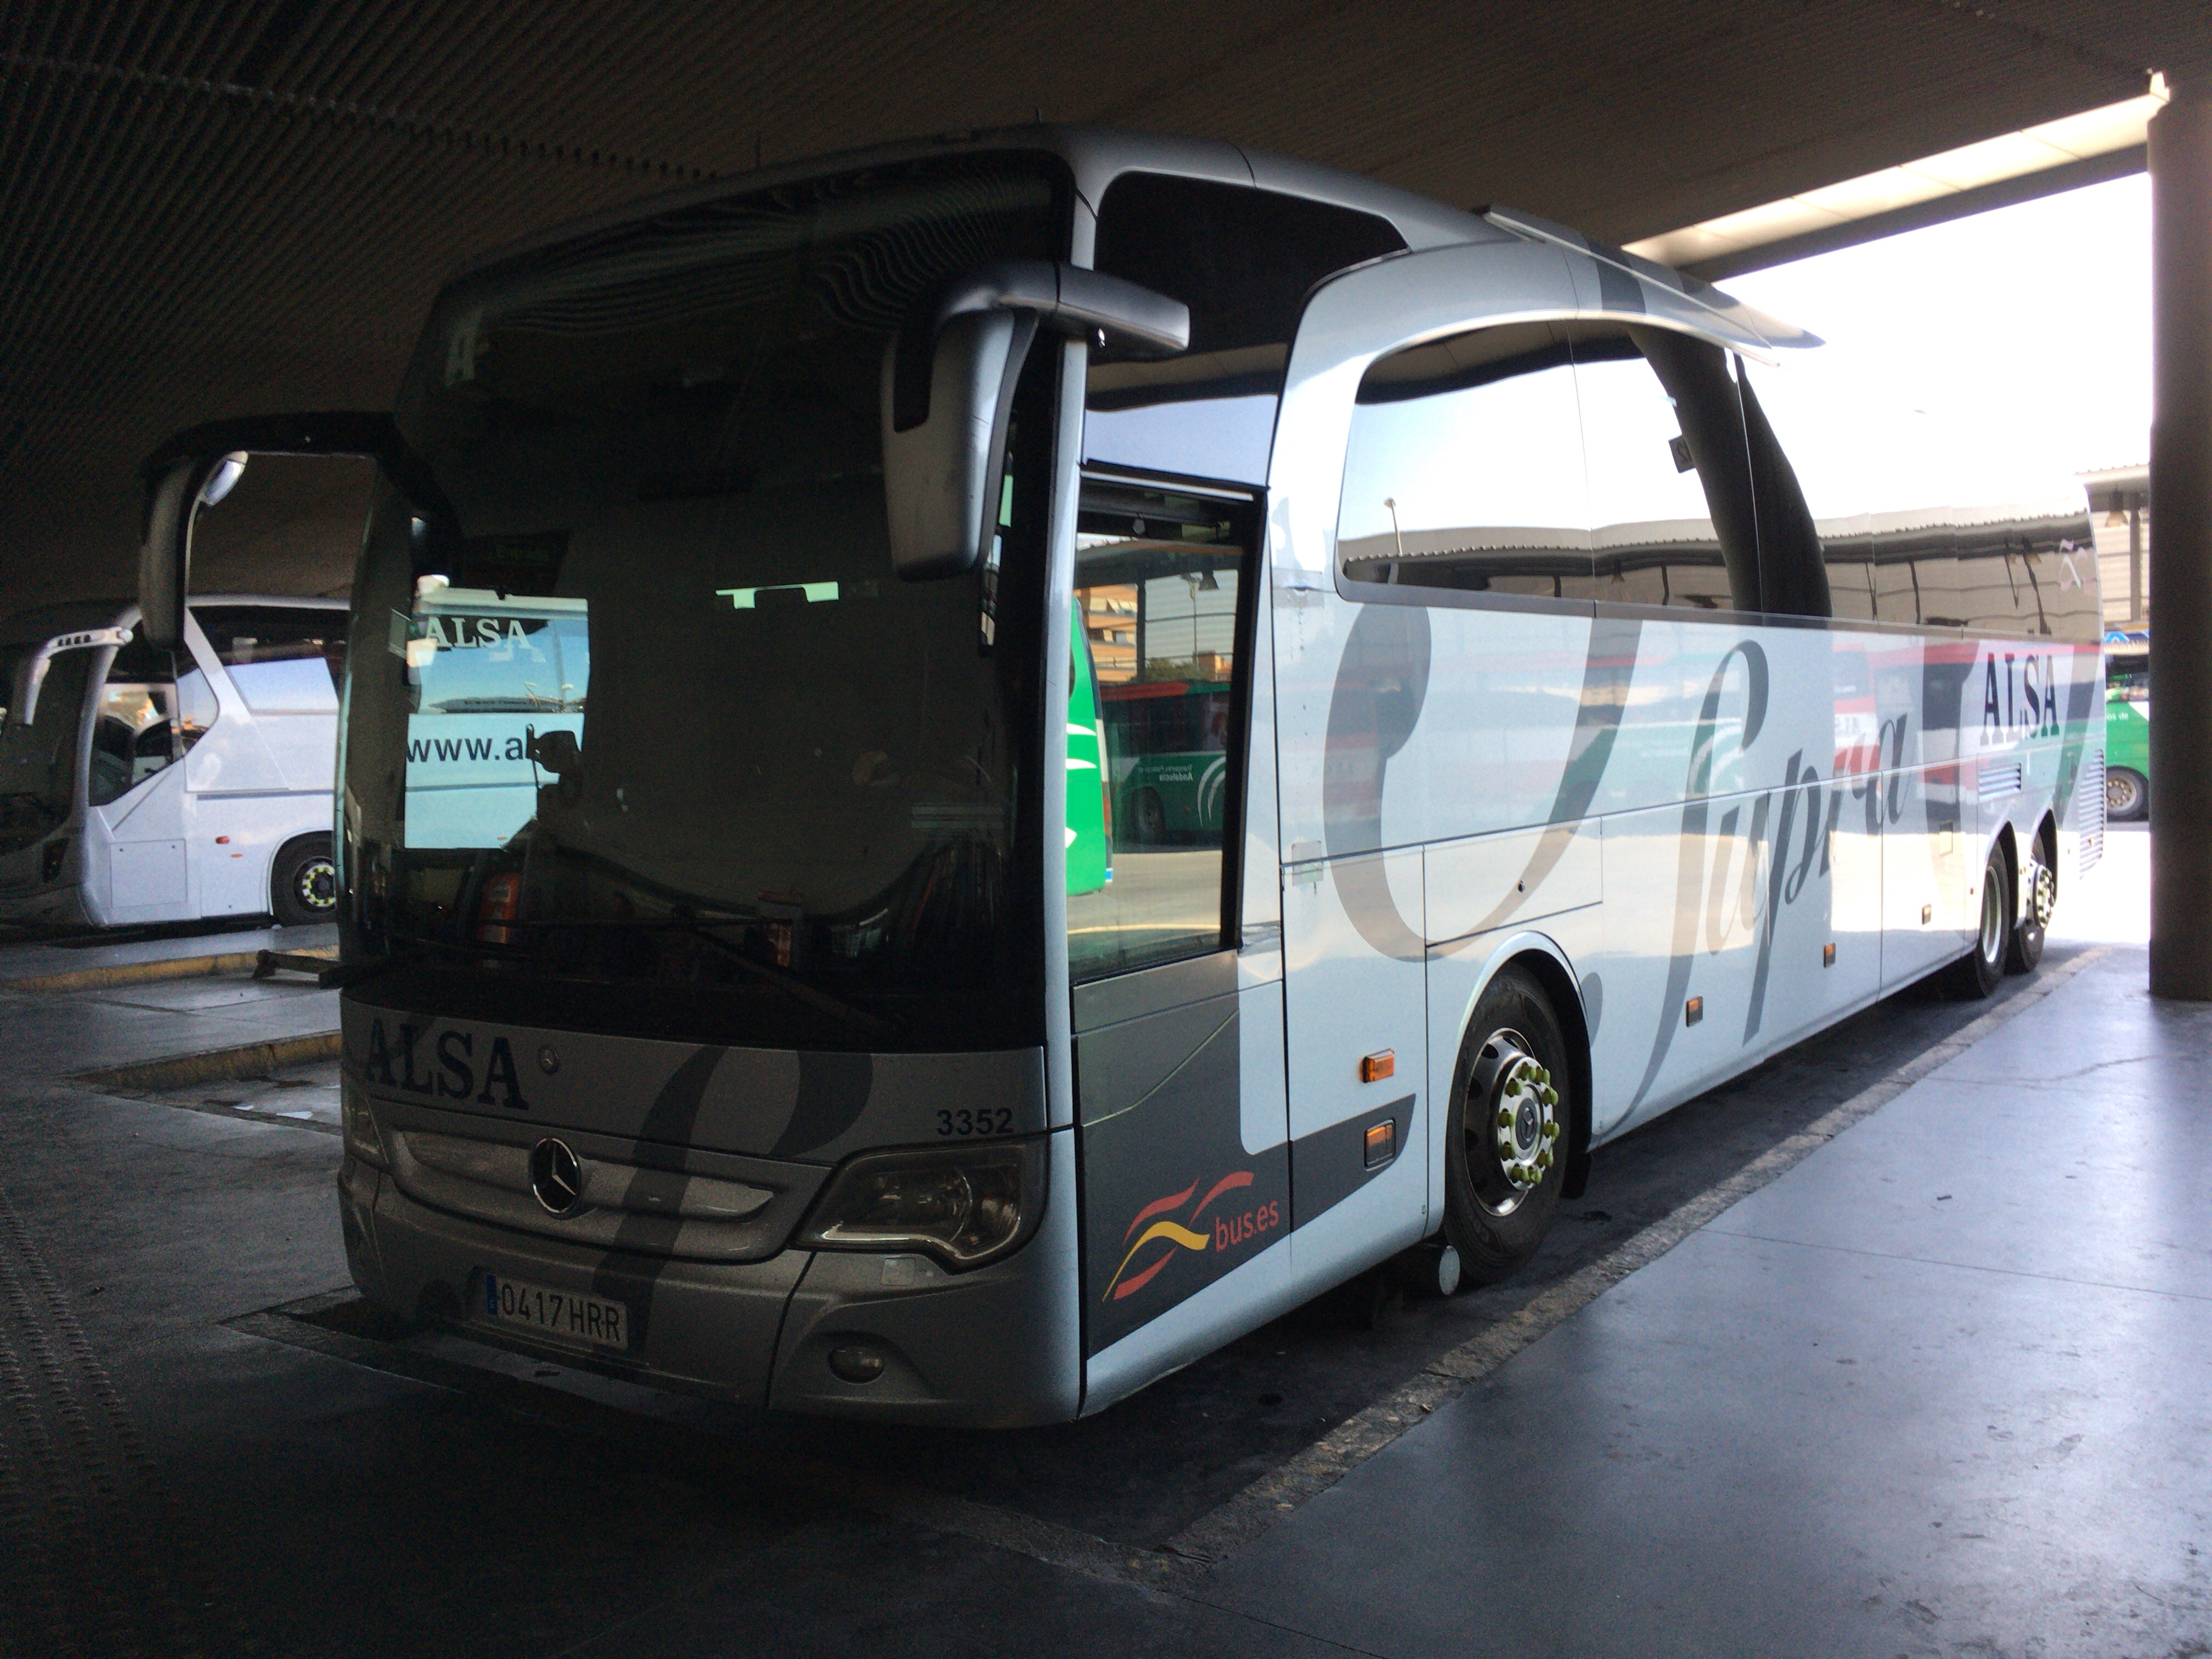 ALSAのSupra Economyのバス。憧れのメルセデス・ベンツだ